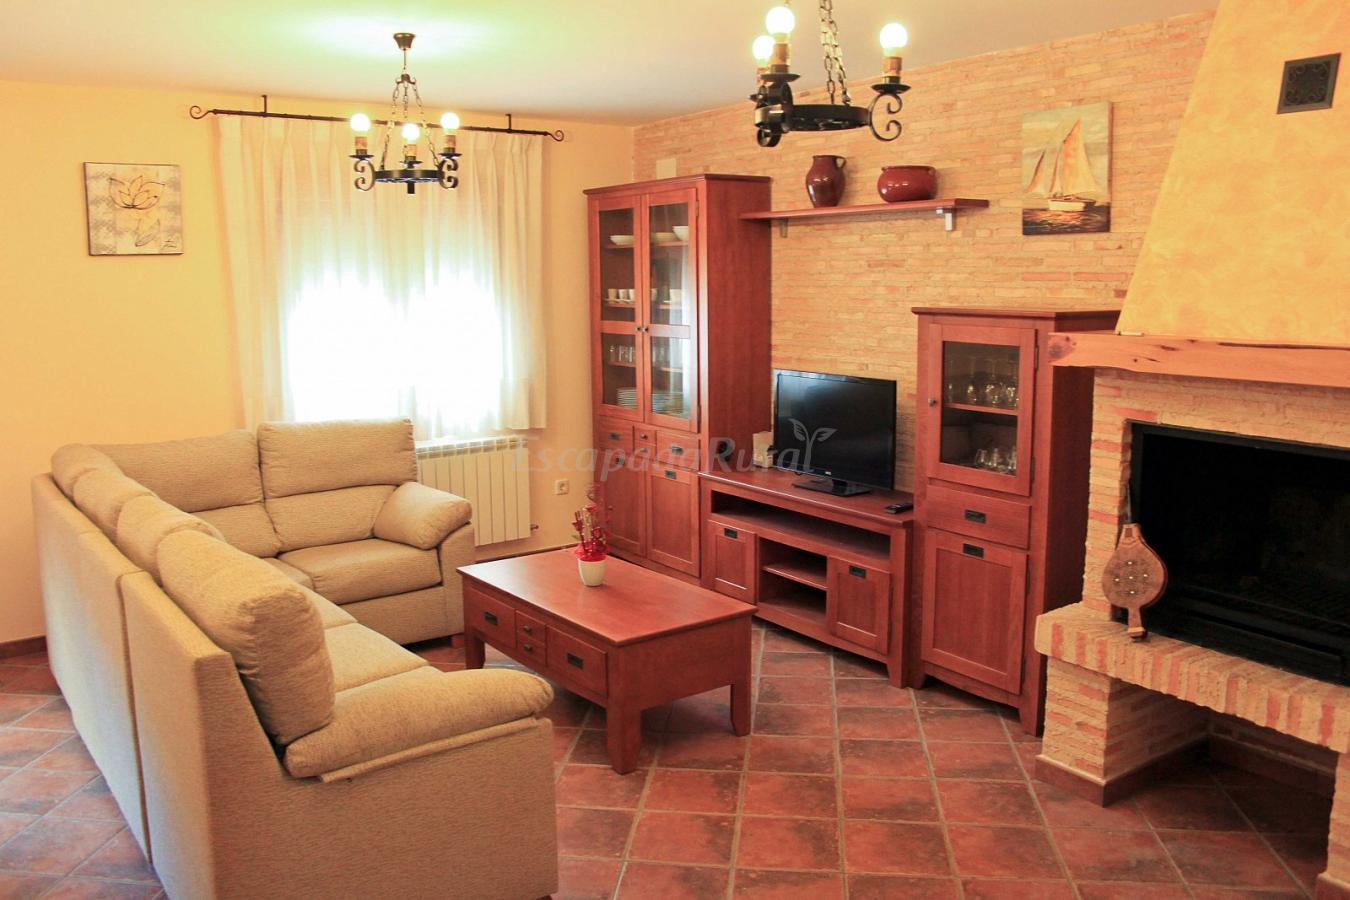 Fotos de casa del castro casa rural en piquera de san esteban soria - Casas rurales en san sebastian baratas ...